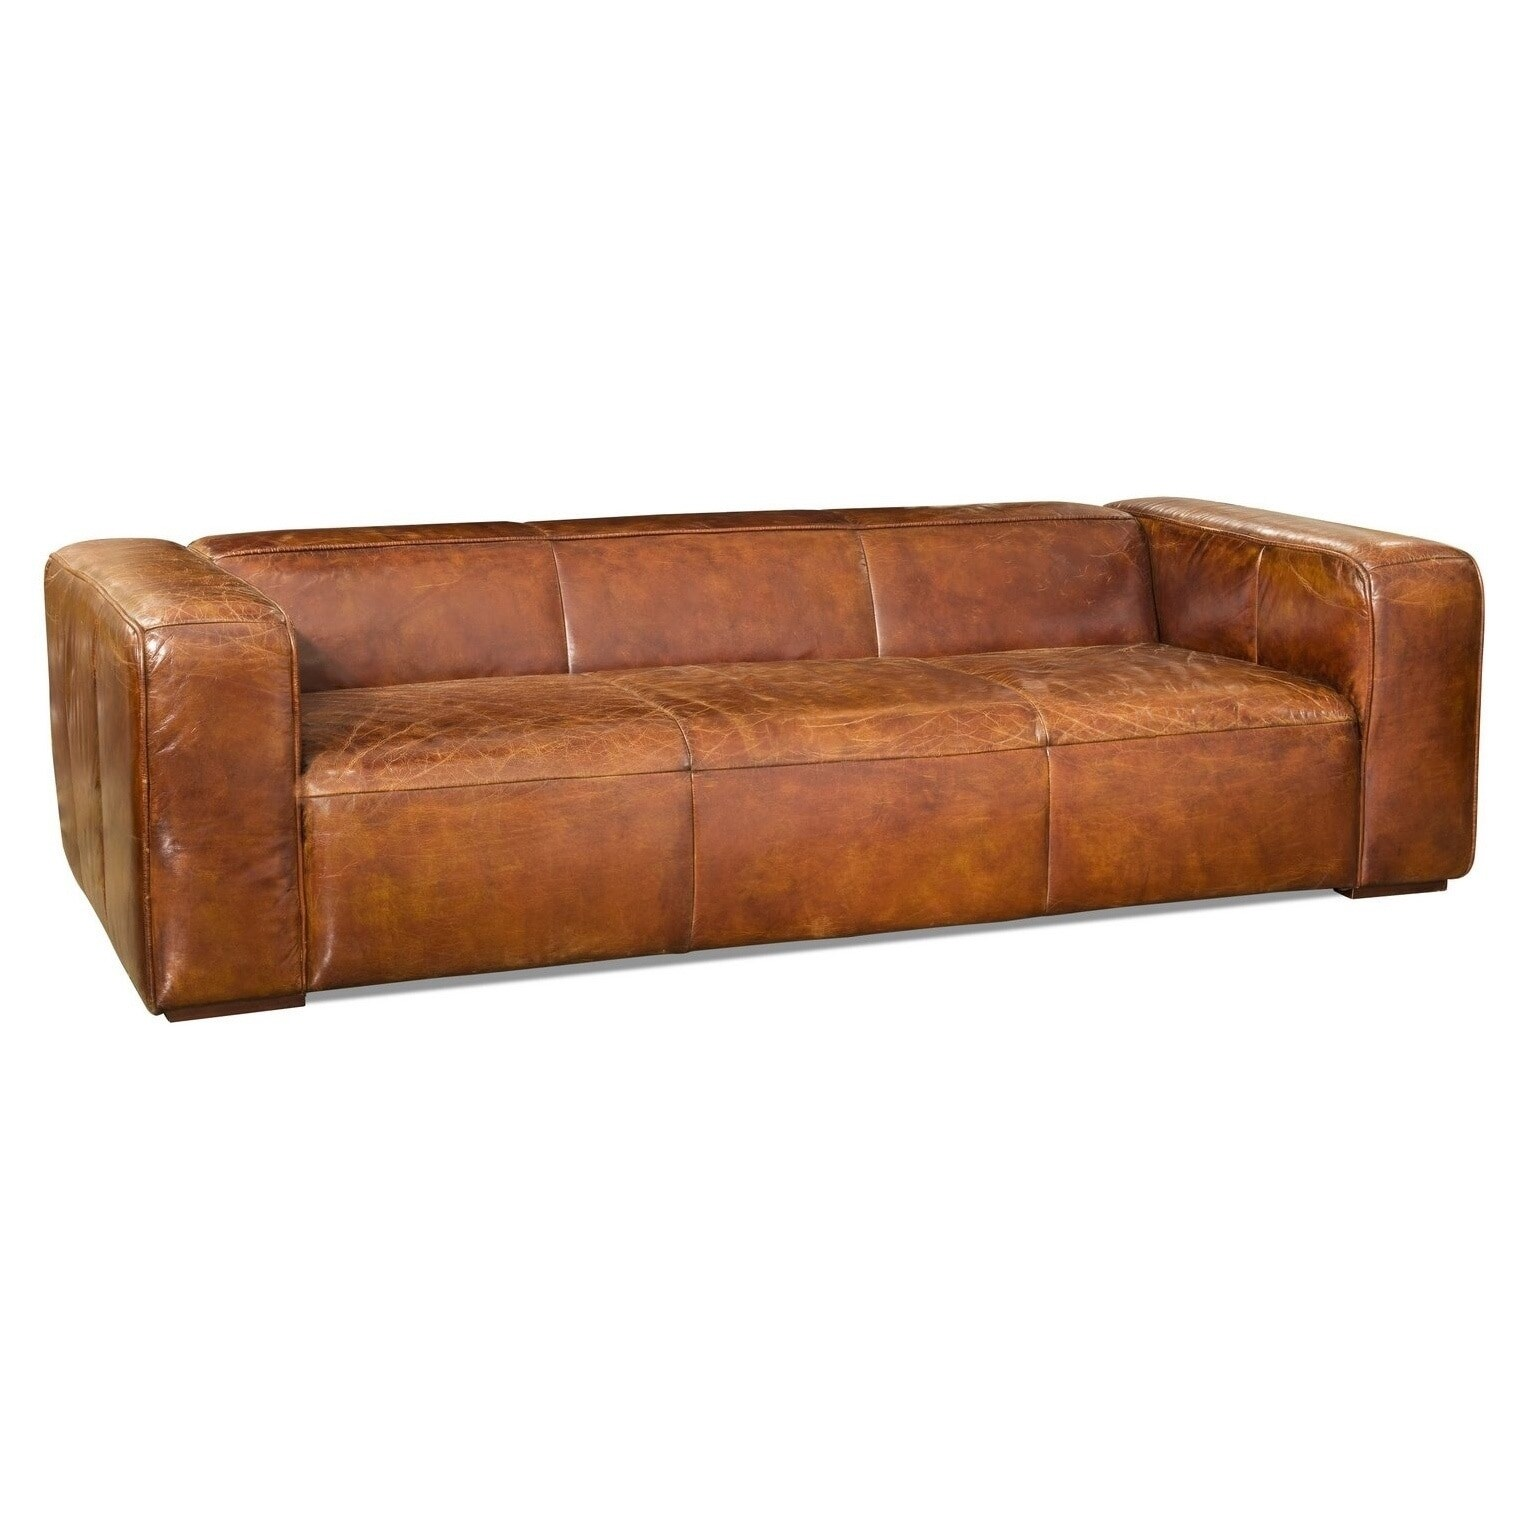 Shop Aurelle Home Vintage Dark Brown Top Grain Leather Sofa - Free ...